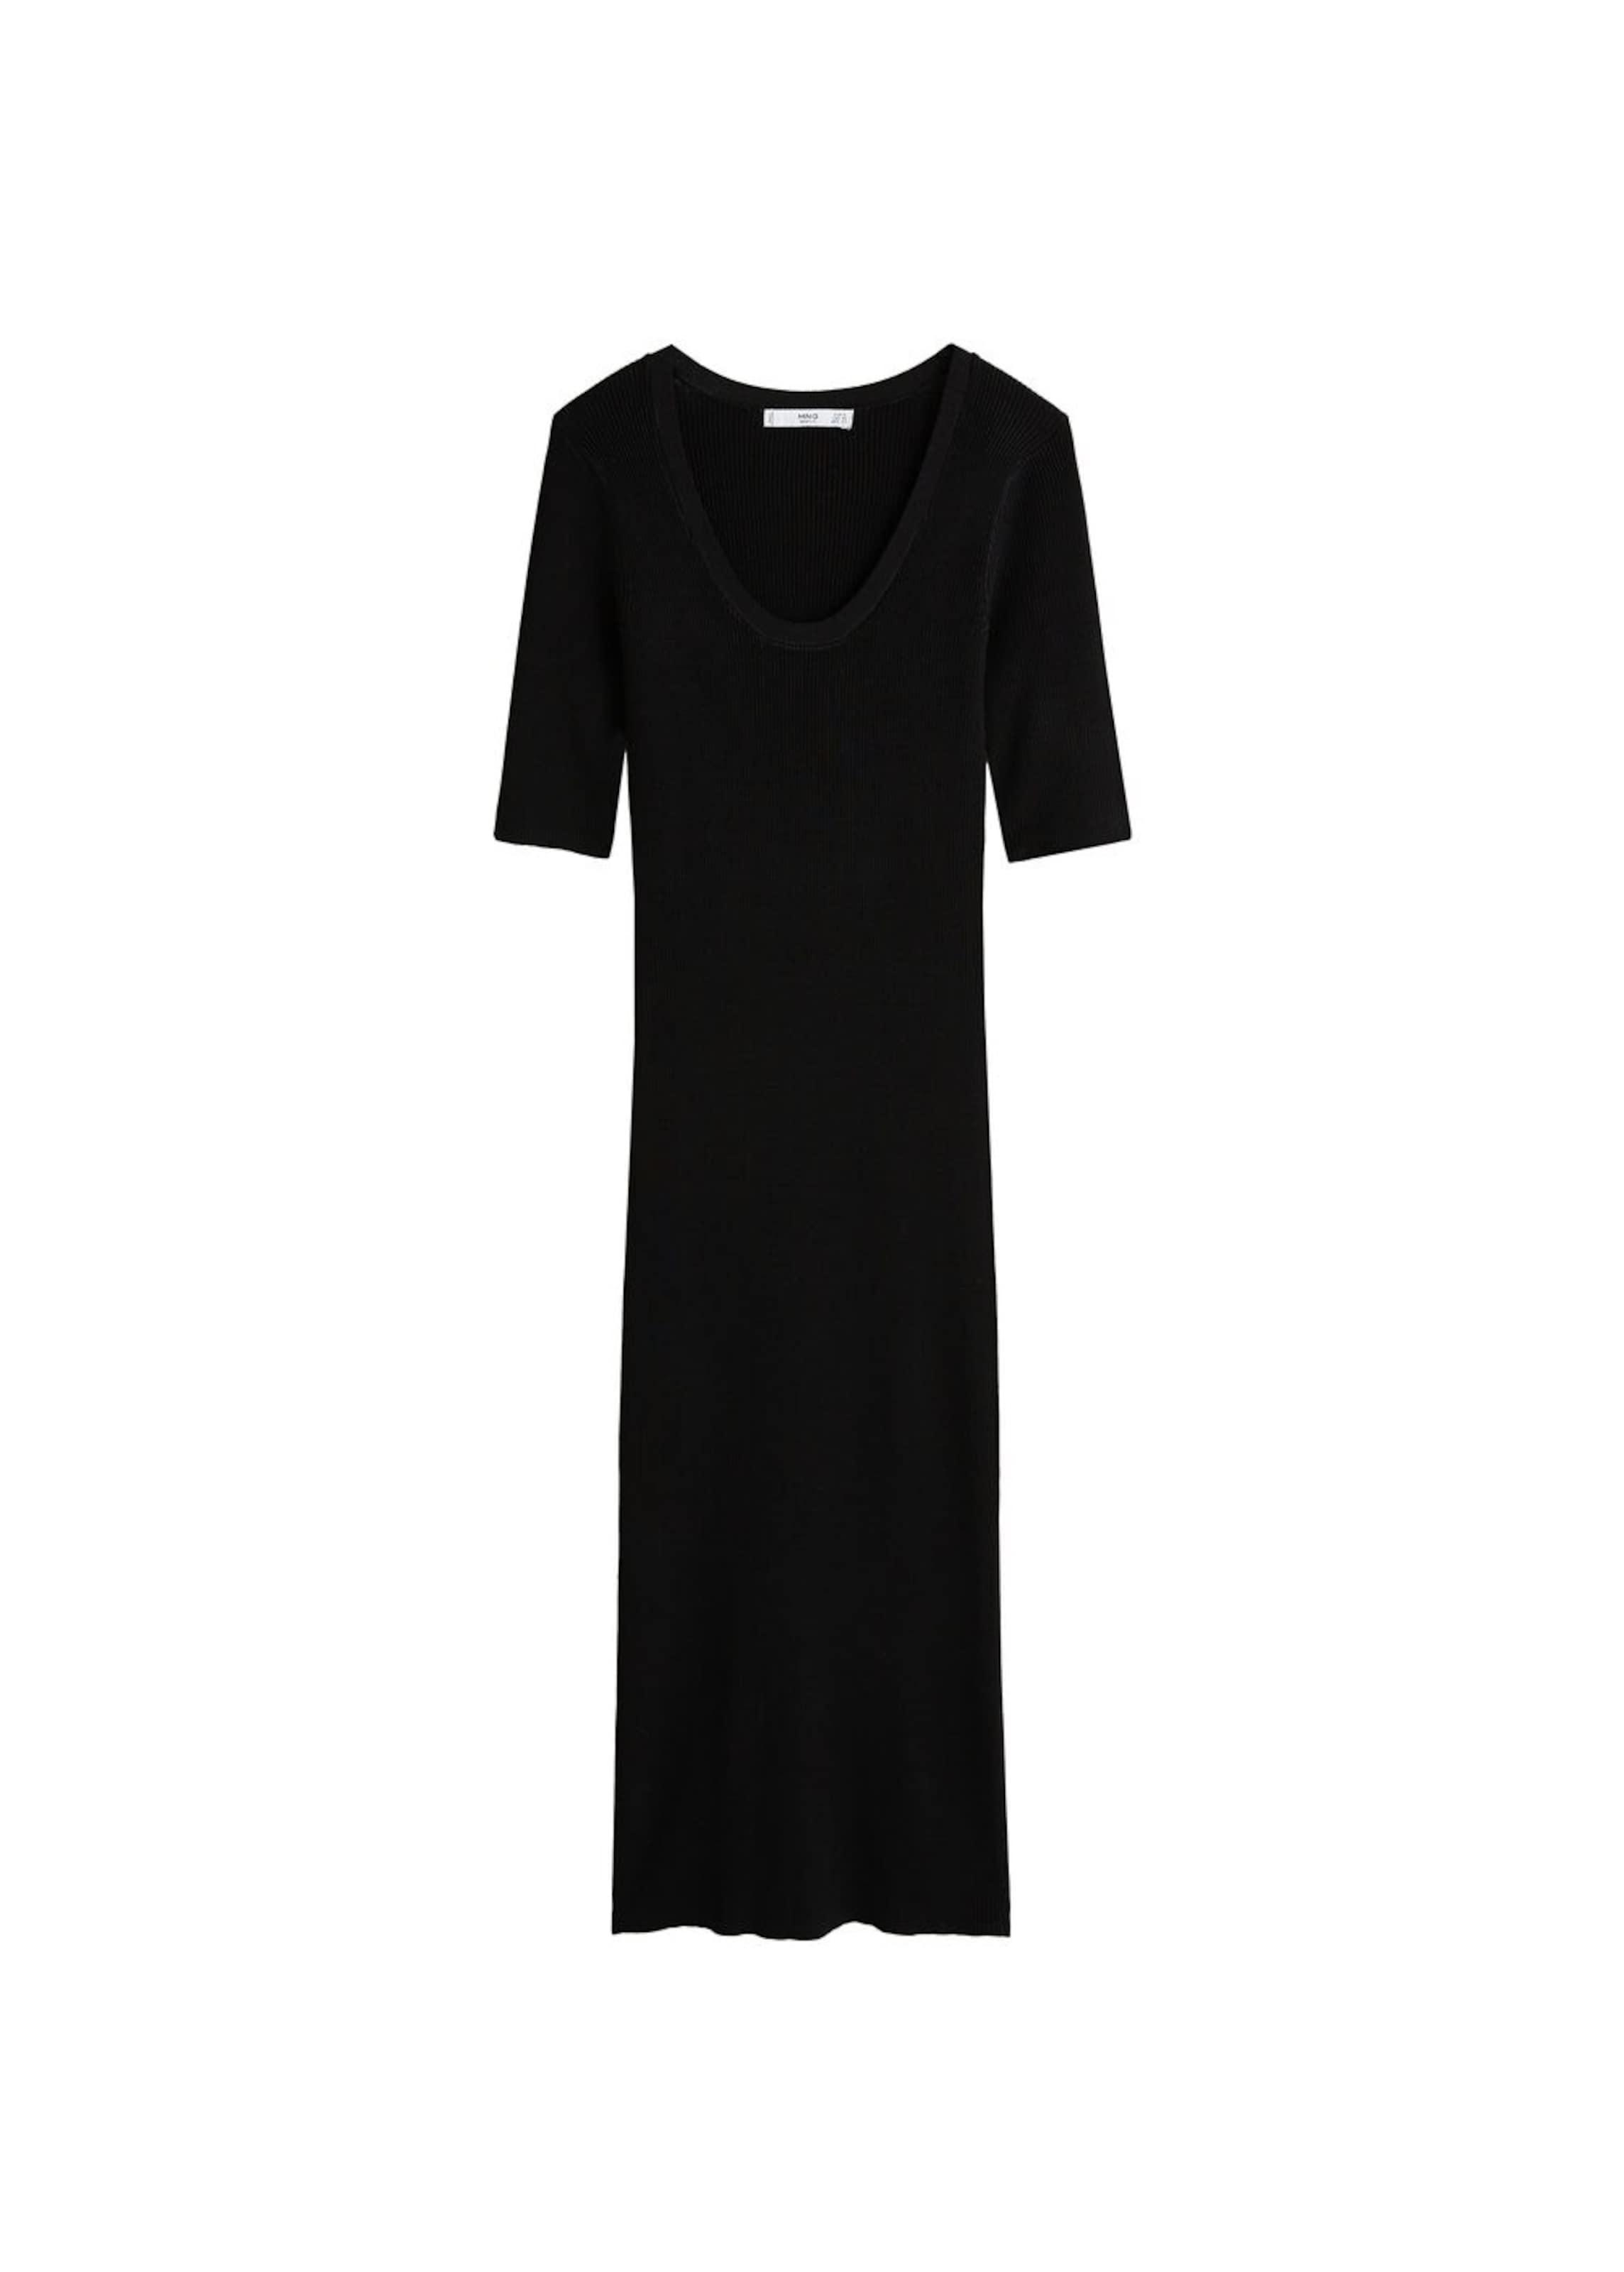 Mango 'elliot' Kleid Mango Schwarz Kleid In 'elliot' qzLUjSVpMG